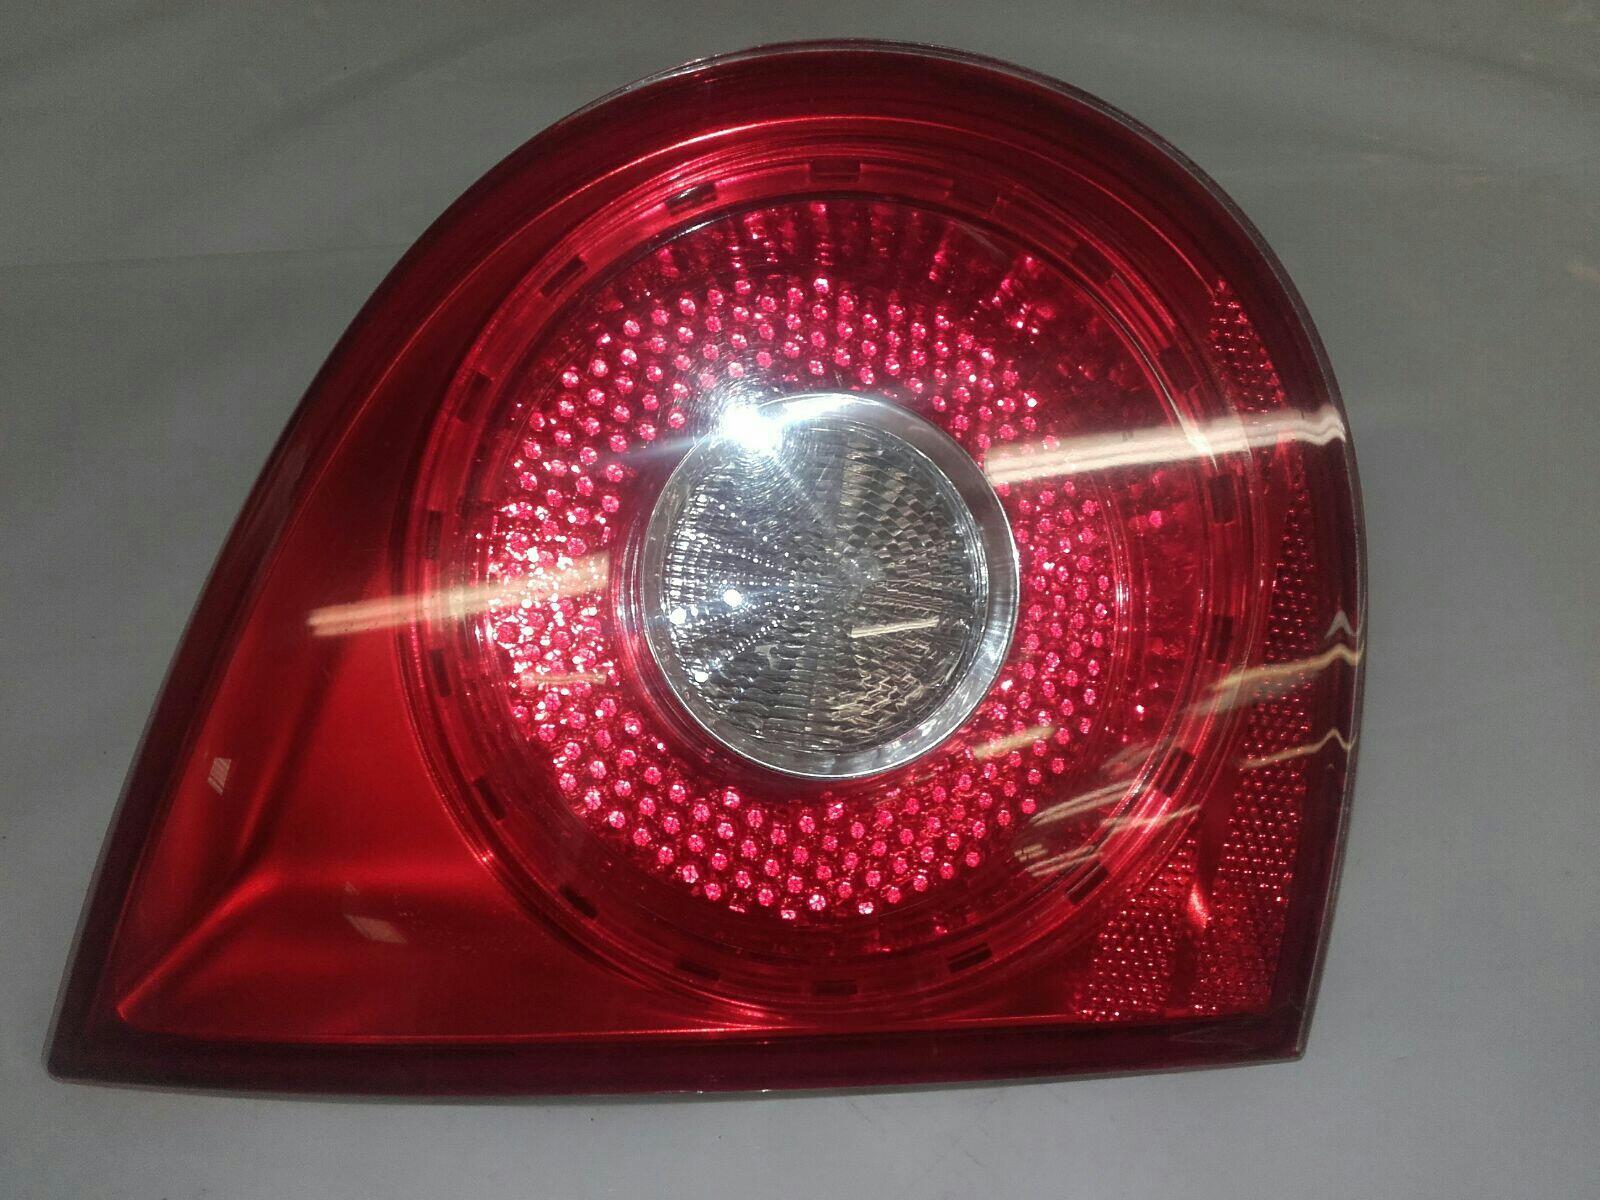 Volkswagen Golf (mk5) 2003 To 2009 Lamp Assembly Rear Inner